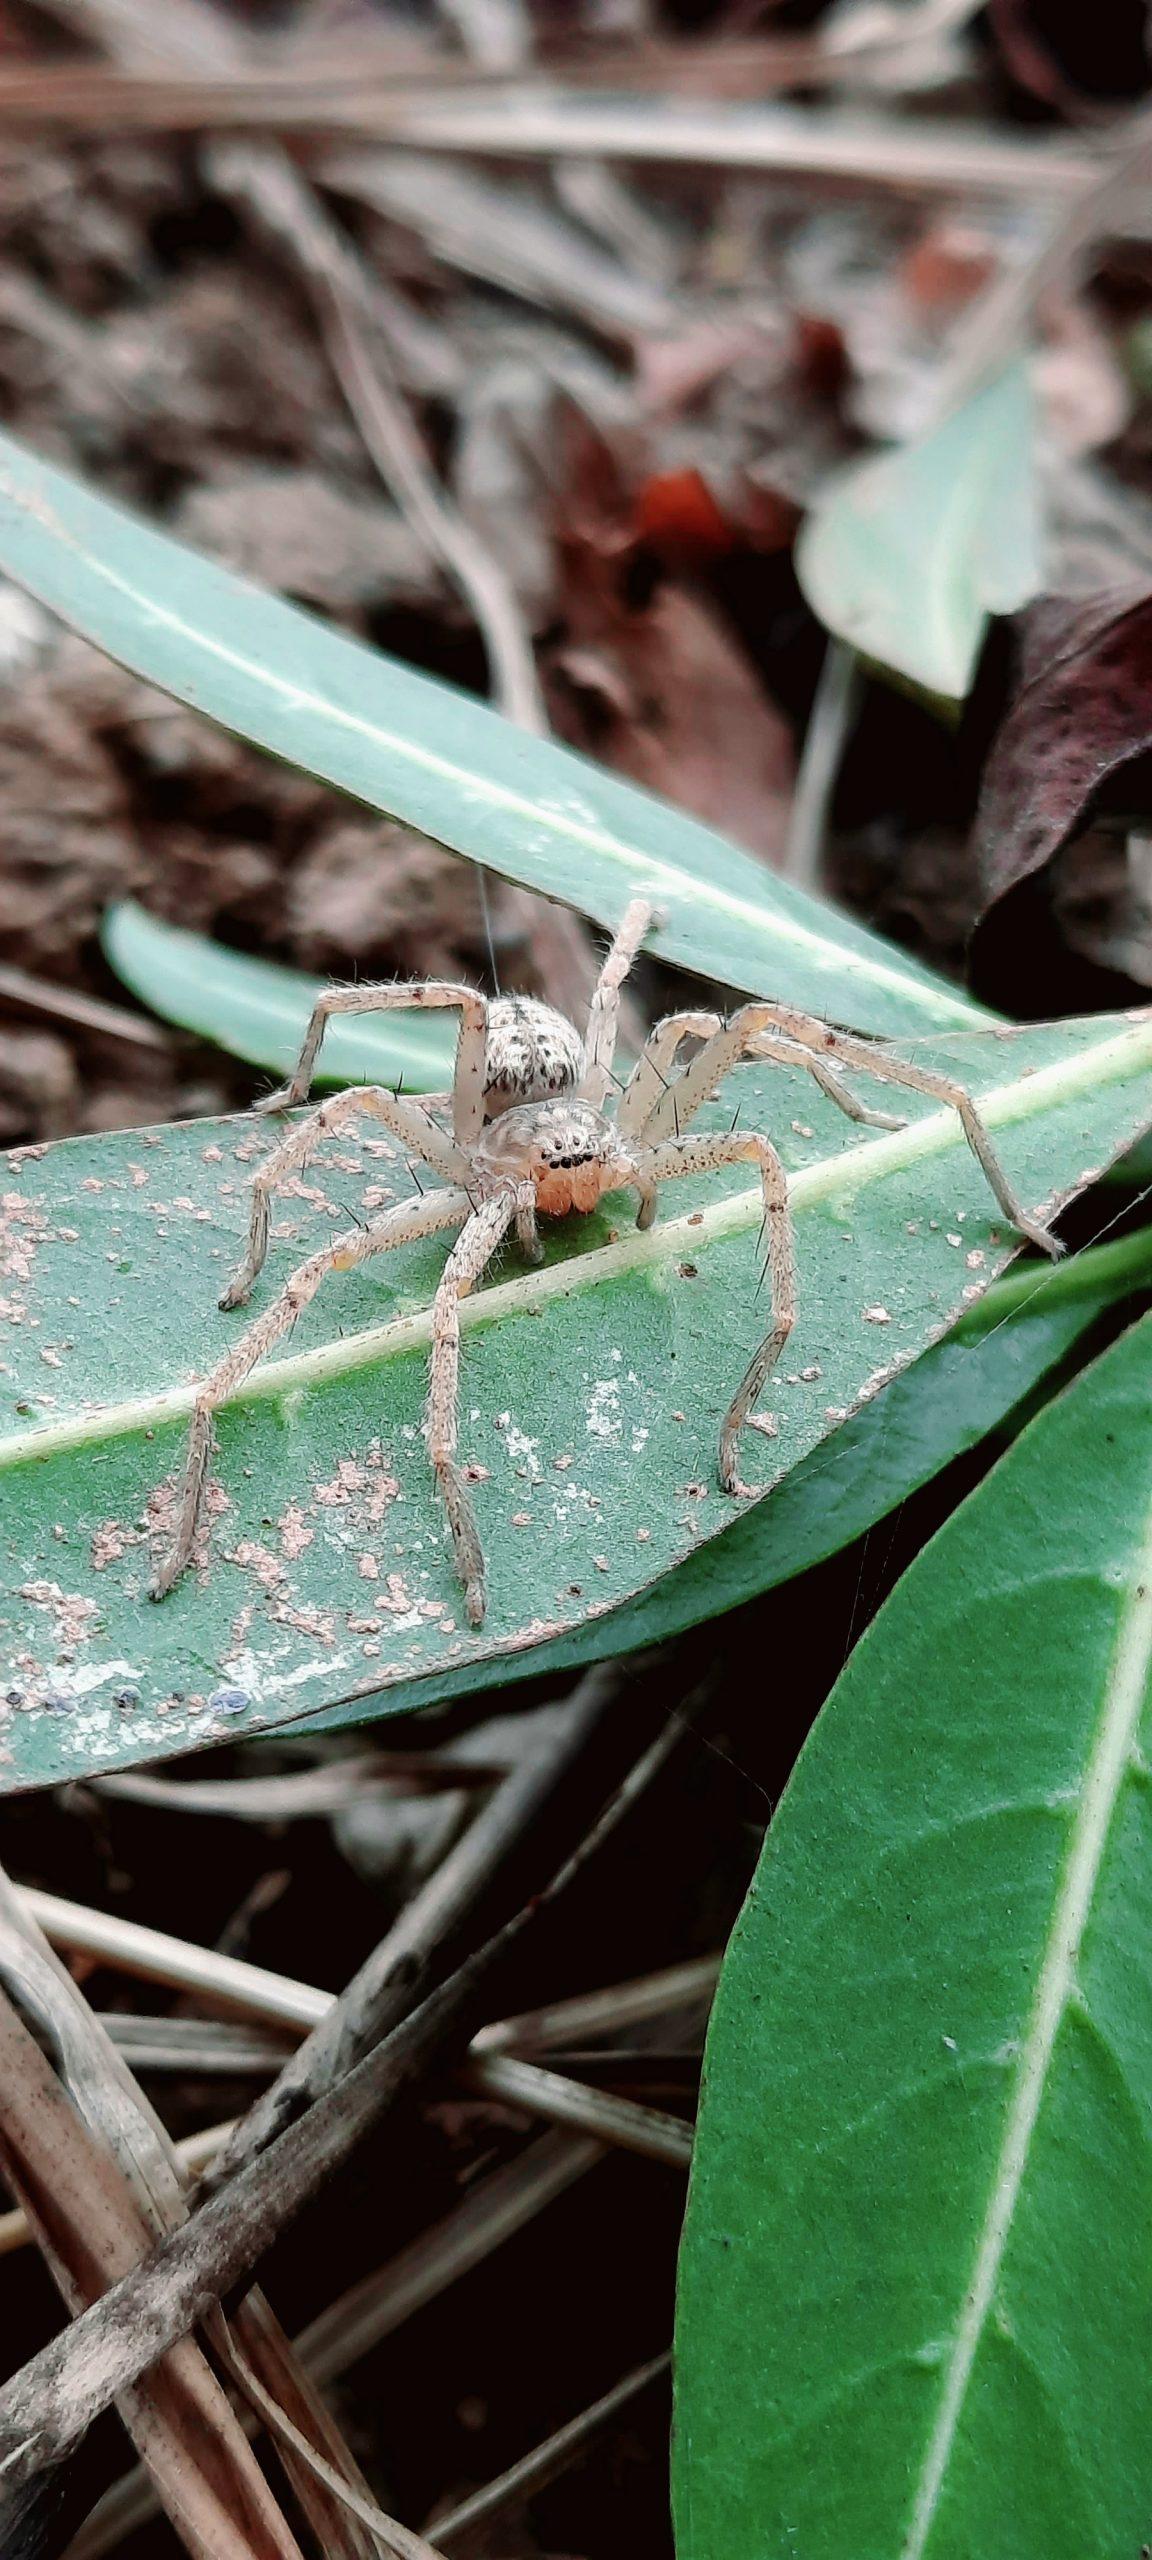 White spider sitting on a leaf